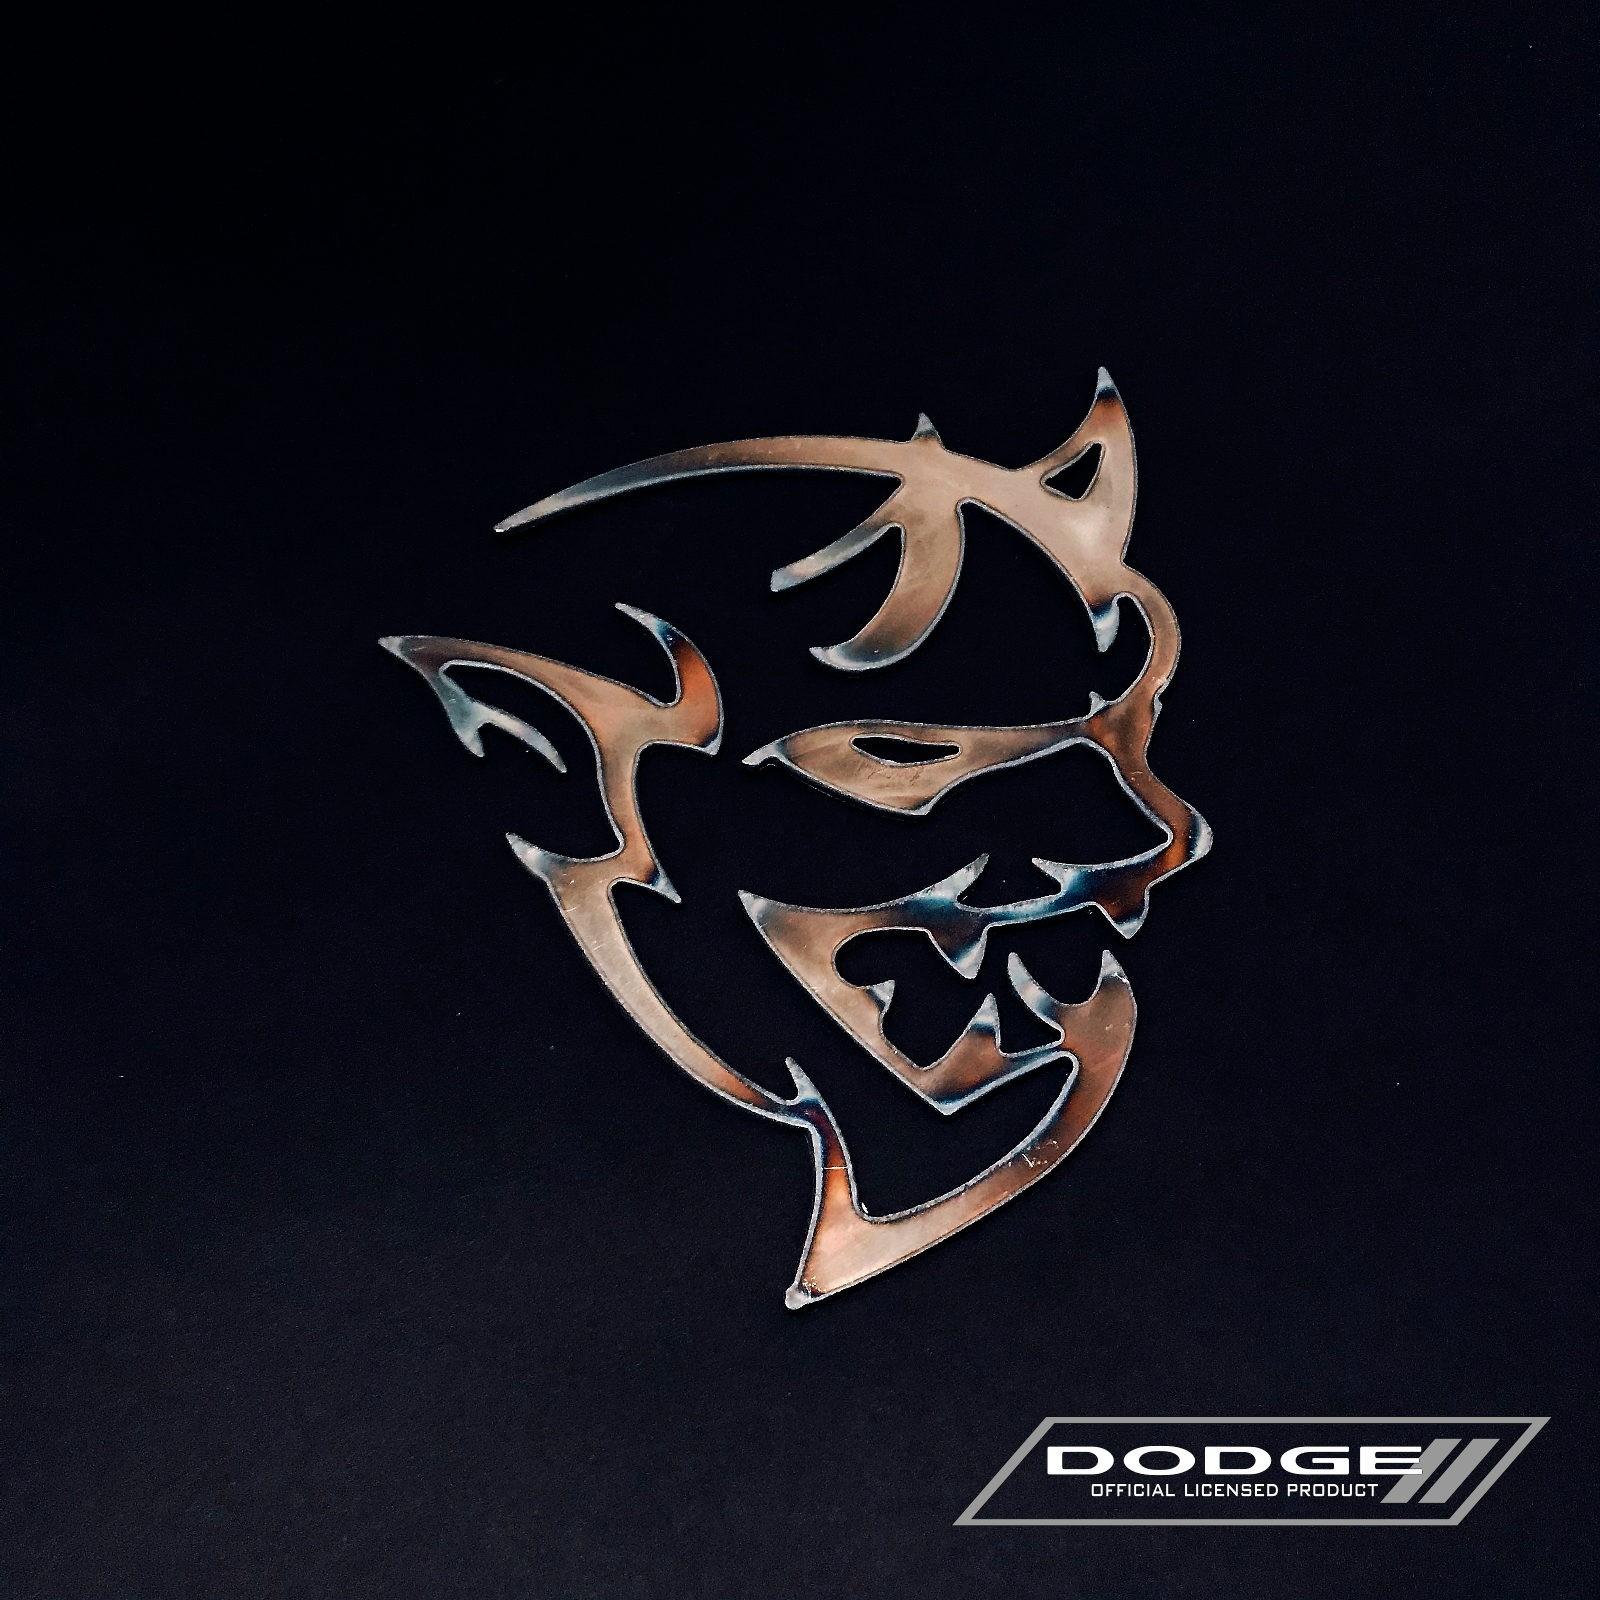 dodge demon symbol  Dodge Demon 2017 Symbol - Speedcult Officially Licensed - dodge demon symbol